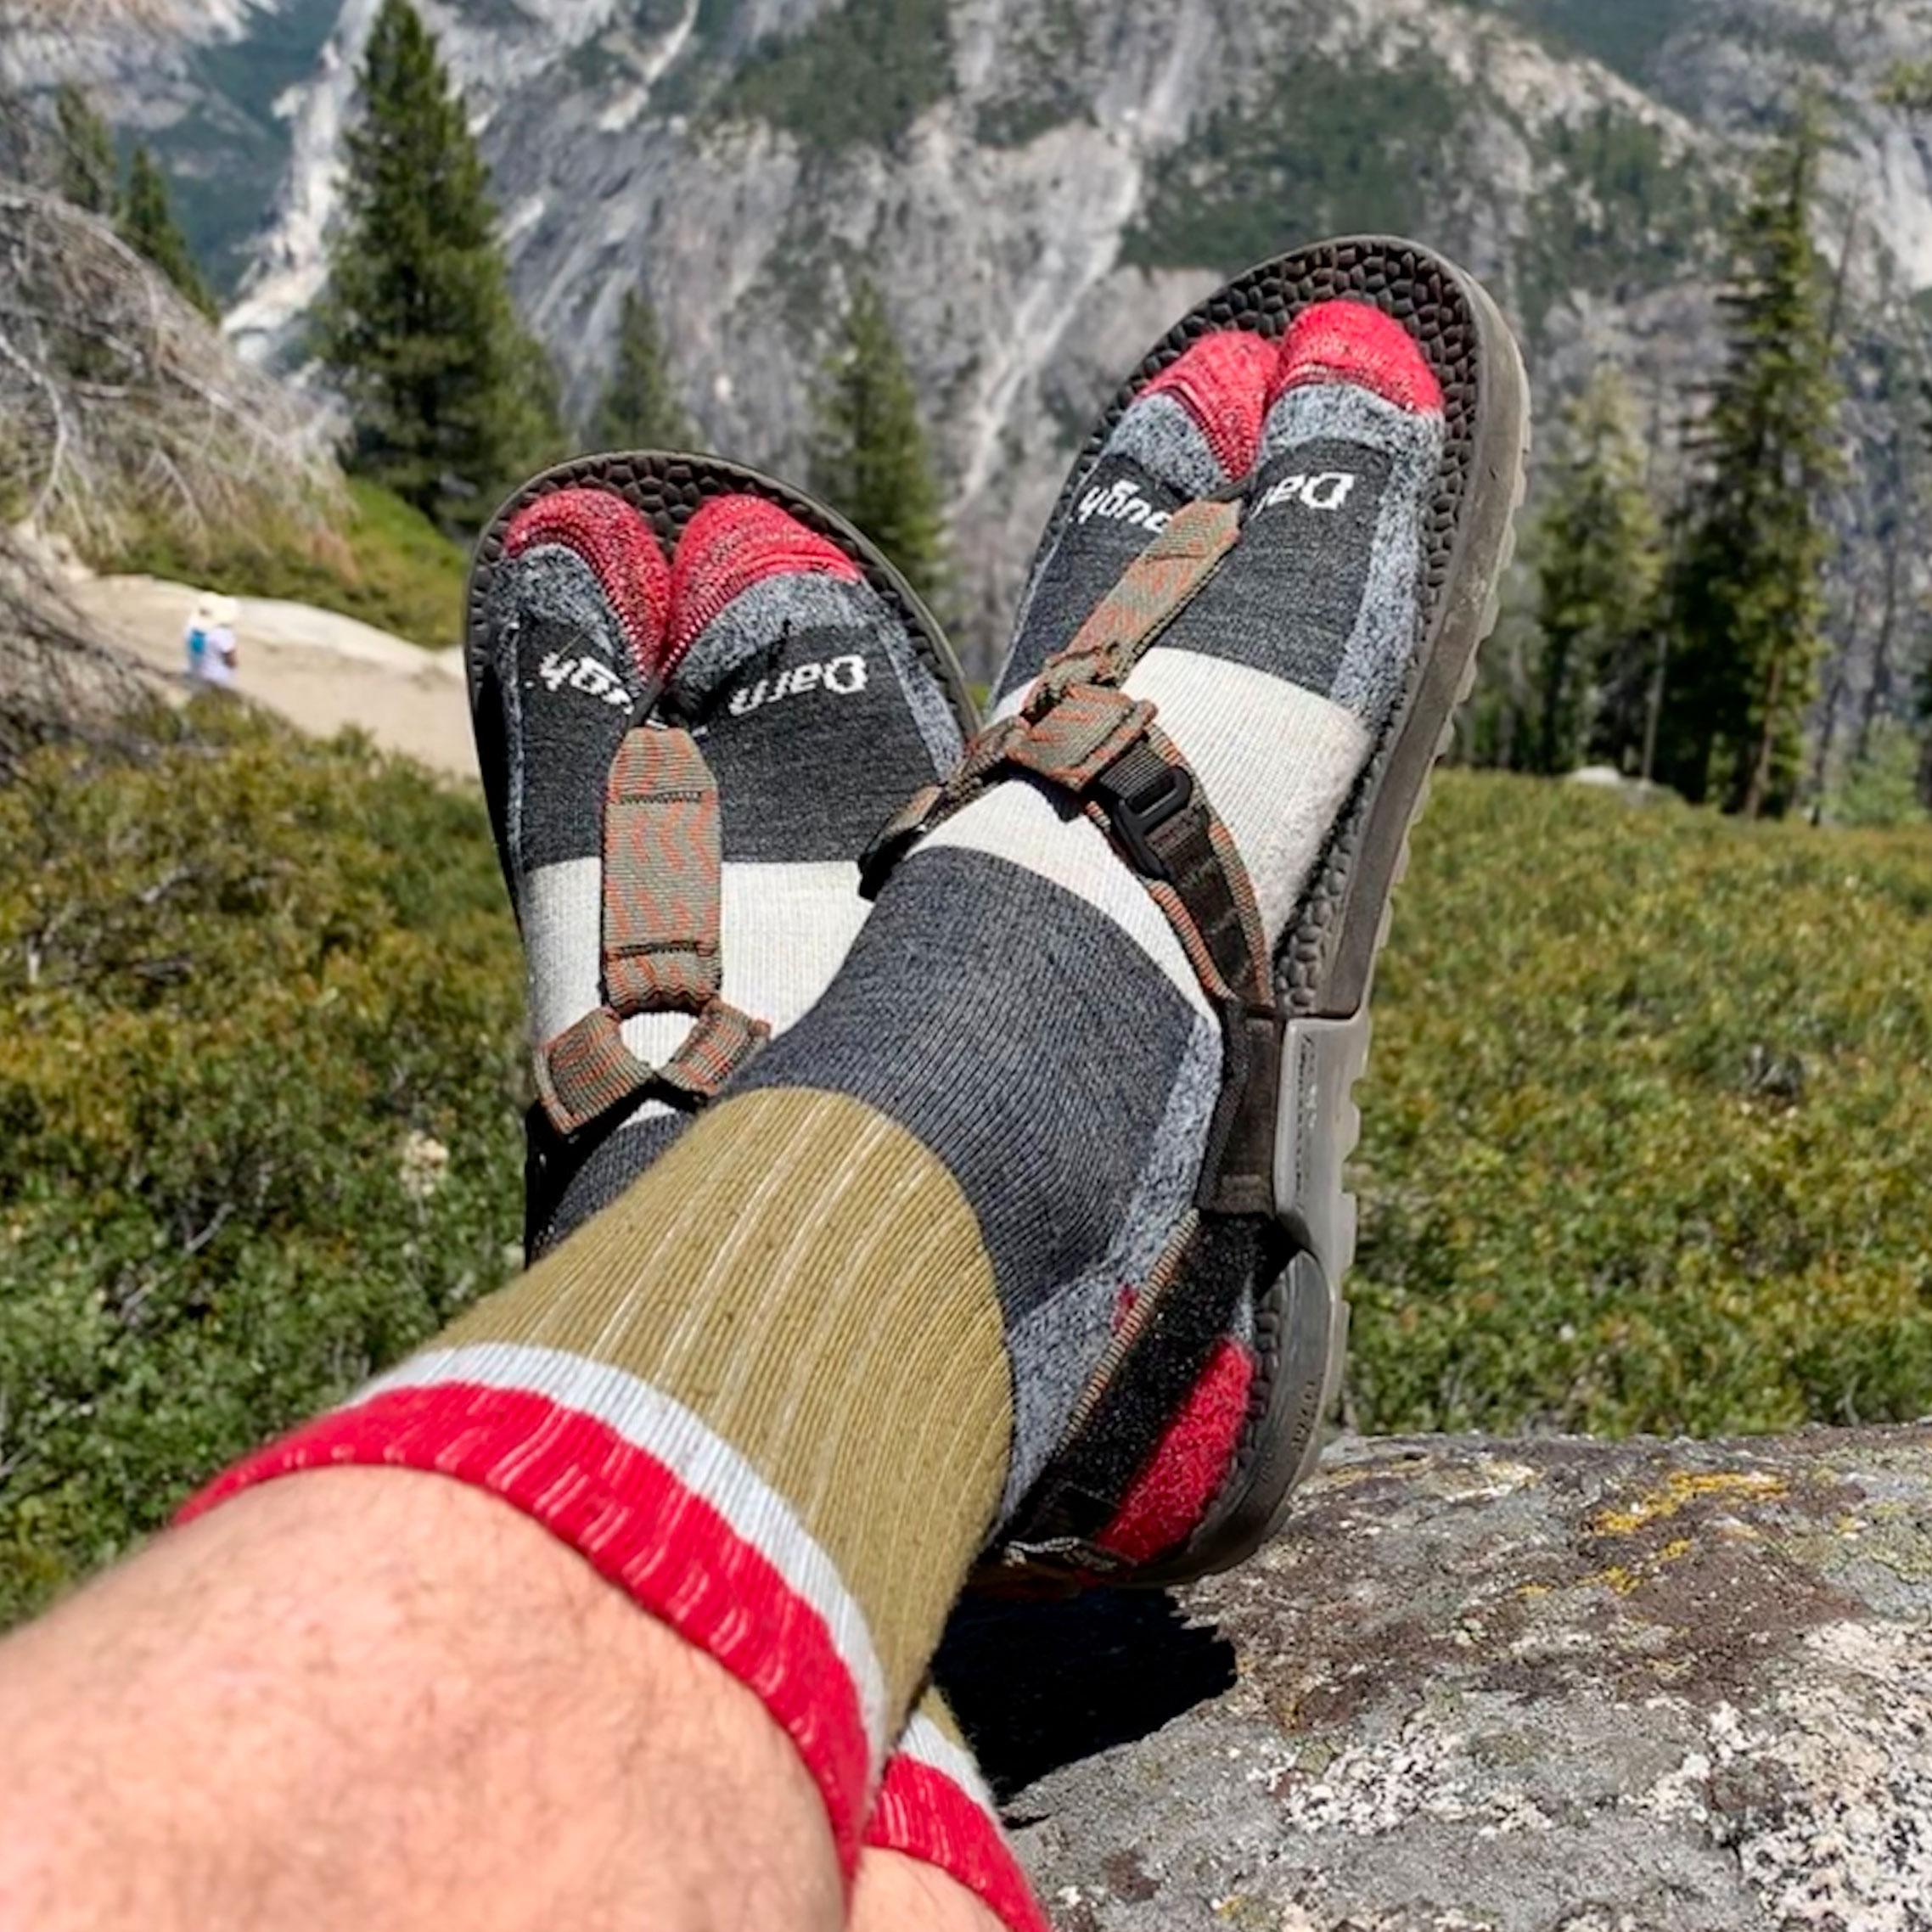 Bedrock Cairn sandal